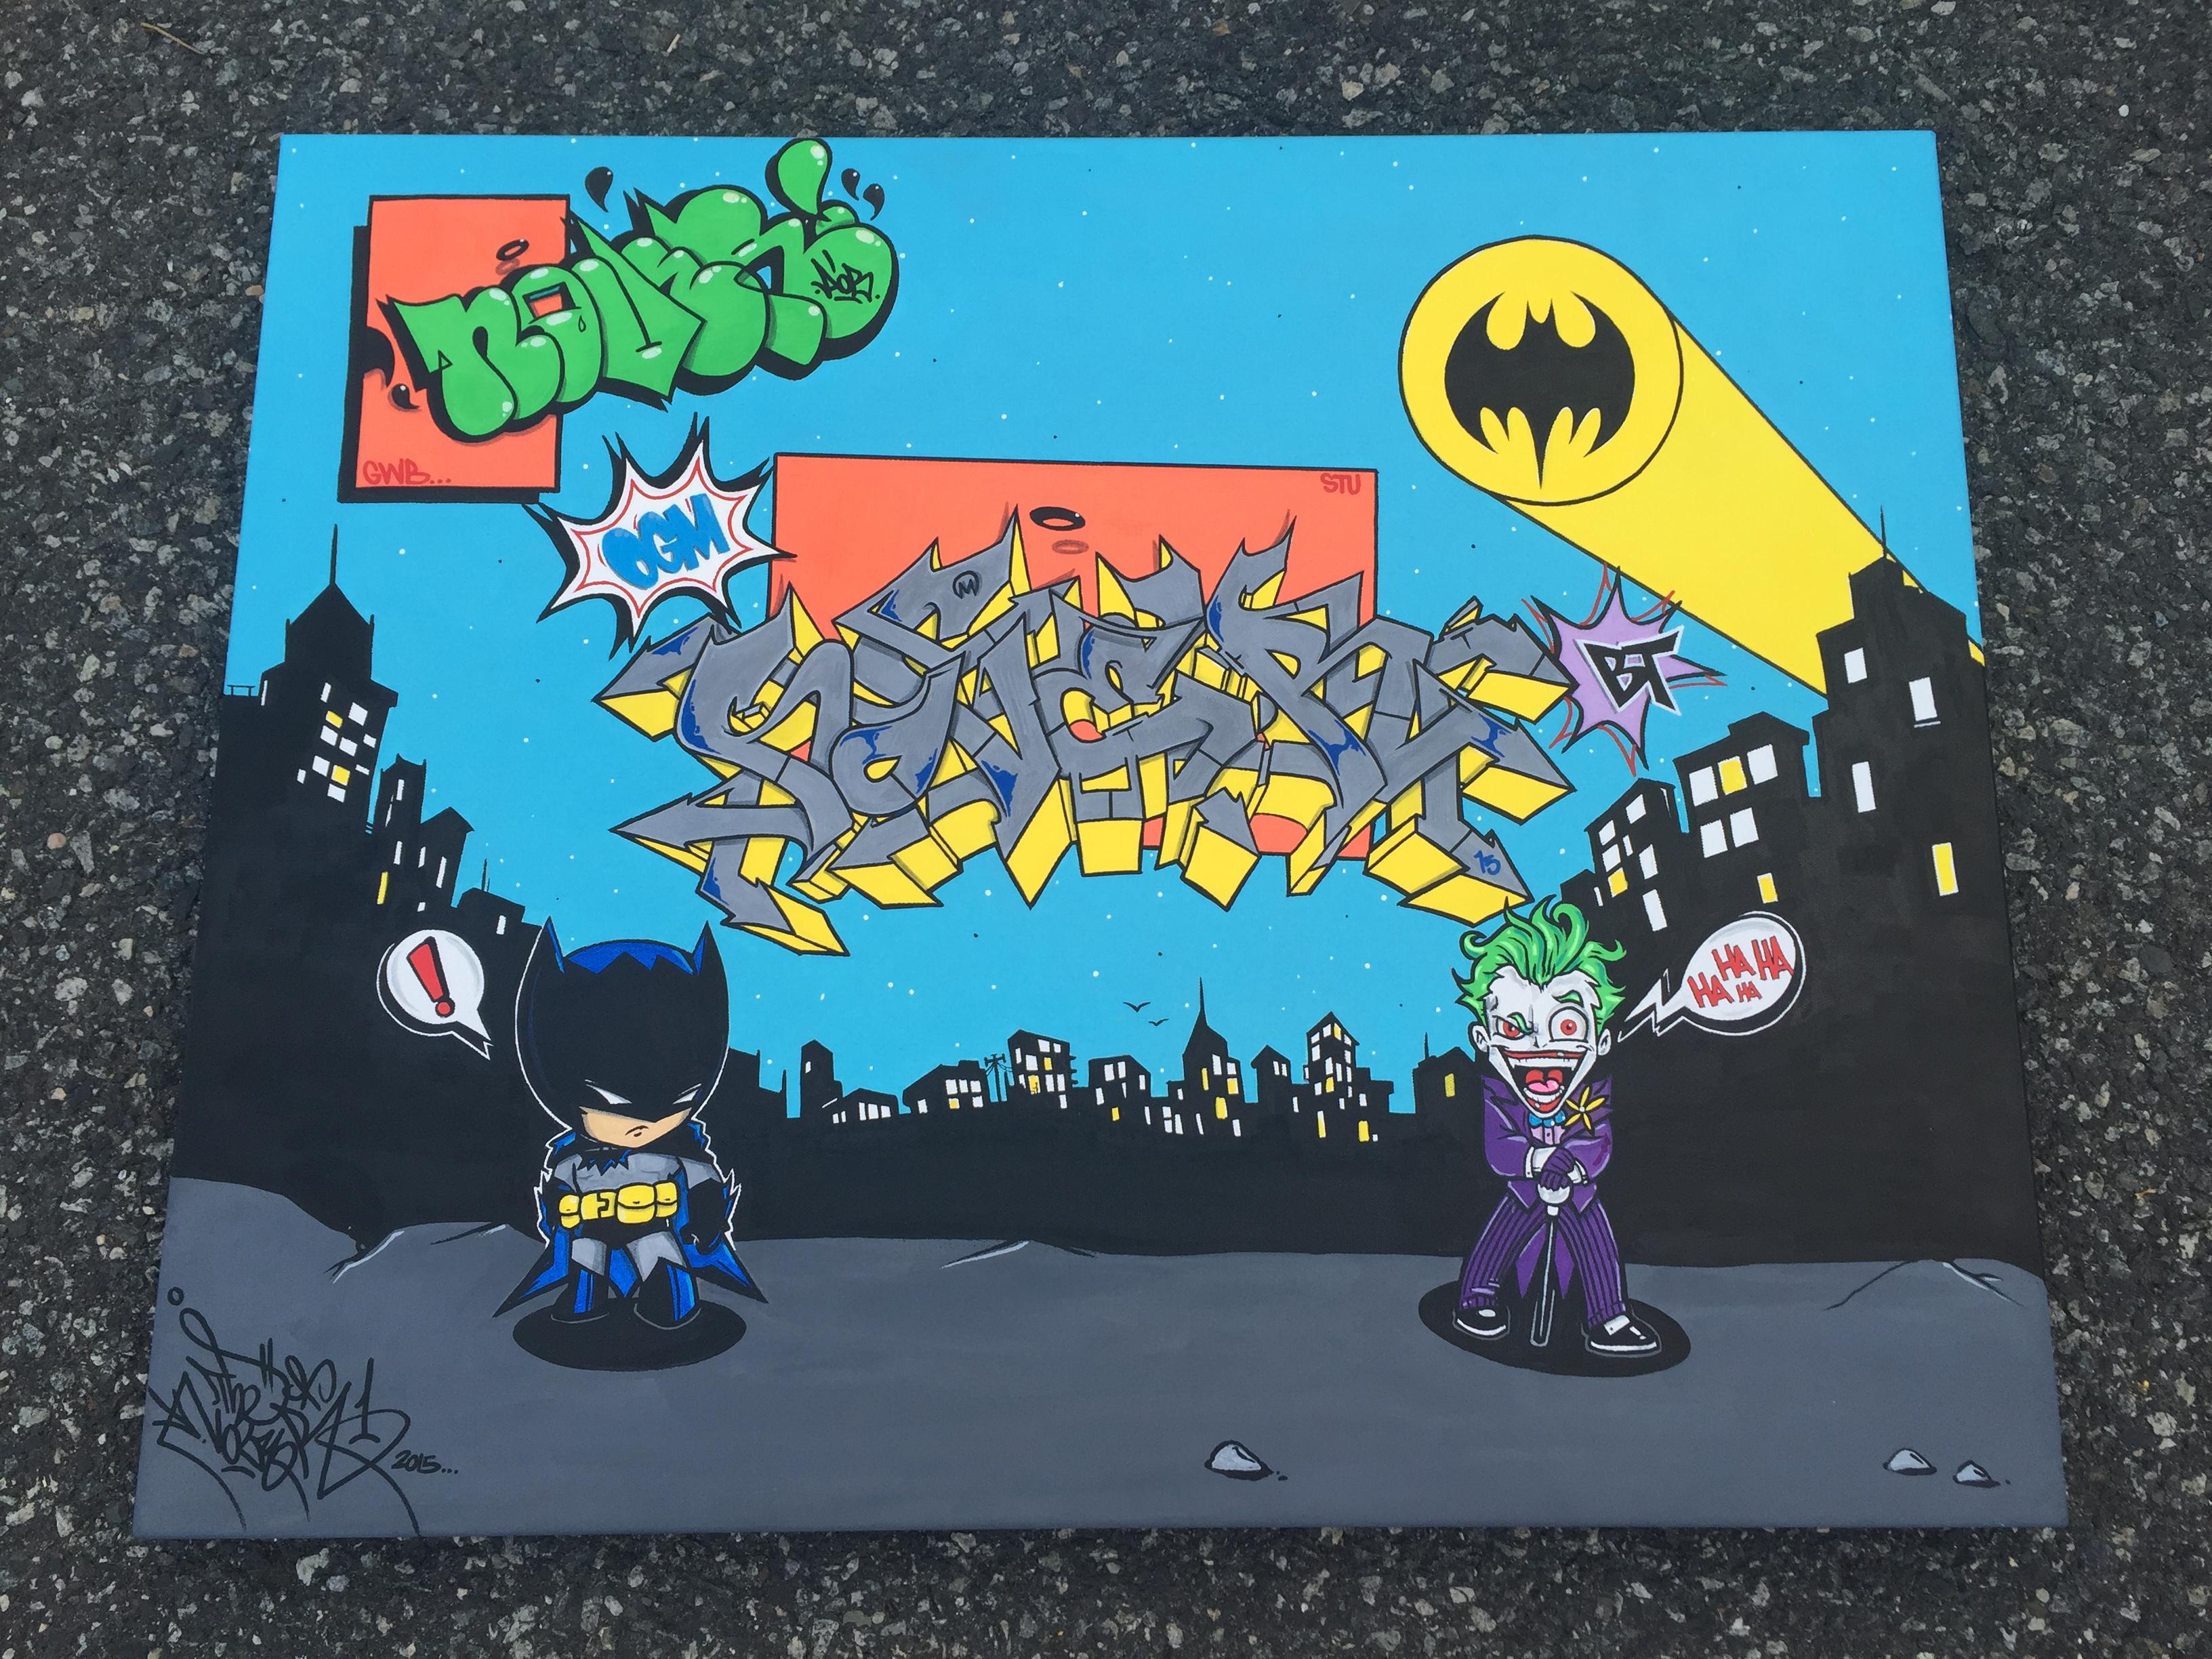 Batman & Joker, Nover on Canvas with Markers & Acrylic Paint. 2015.